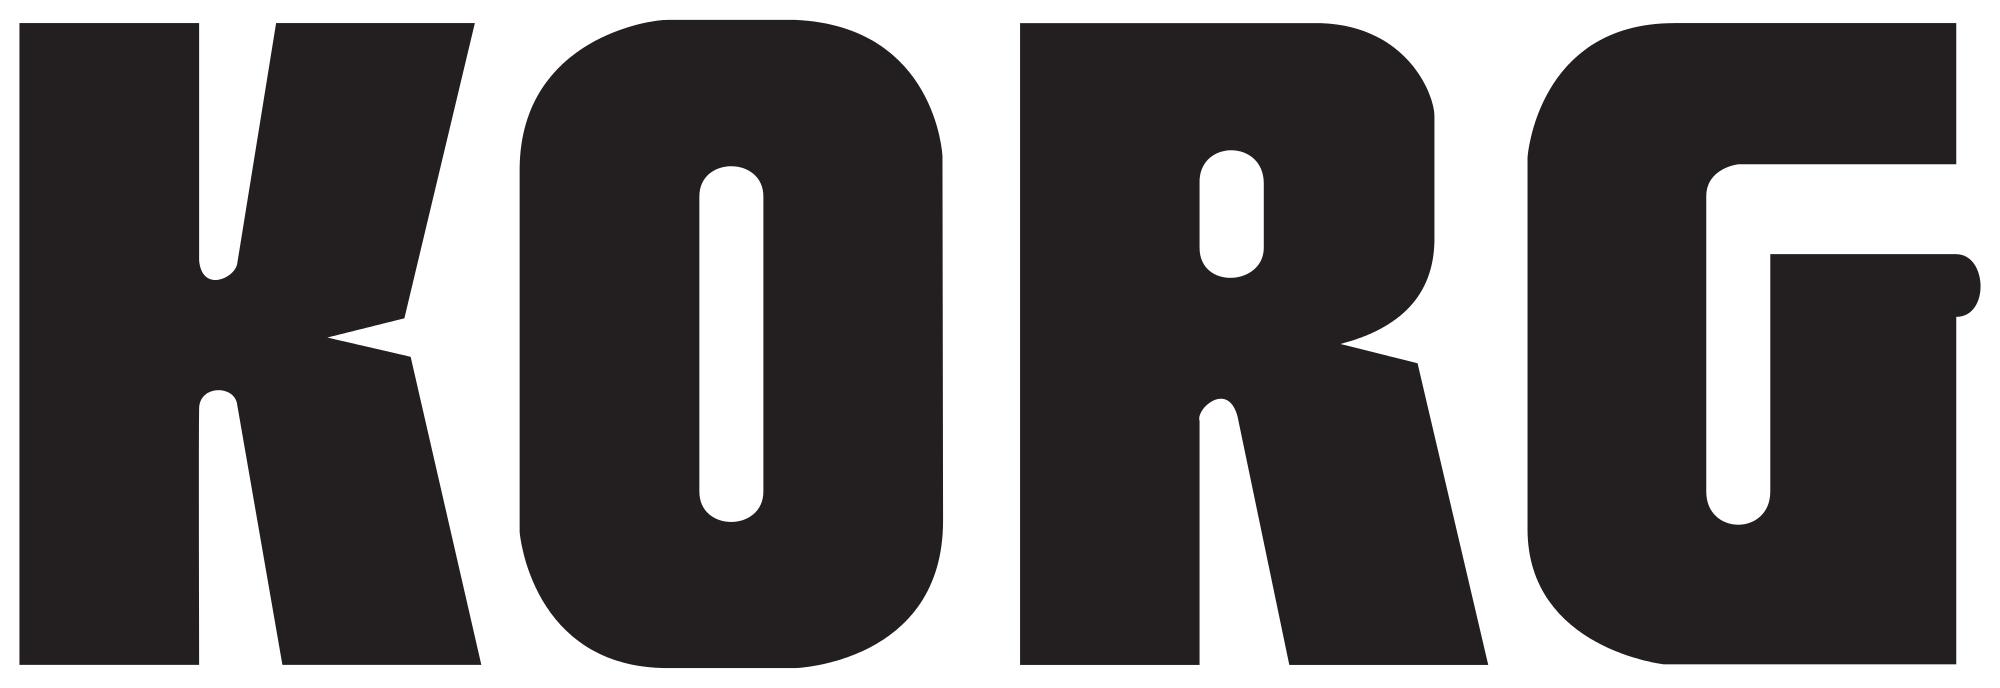 Korg PA4X 76-Keys Professional Arranger Includes PAAS Speaker Bar in Black